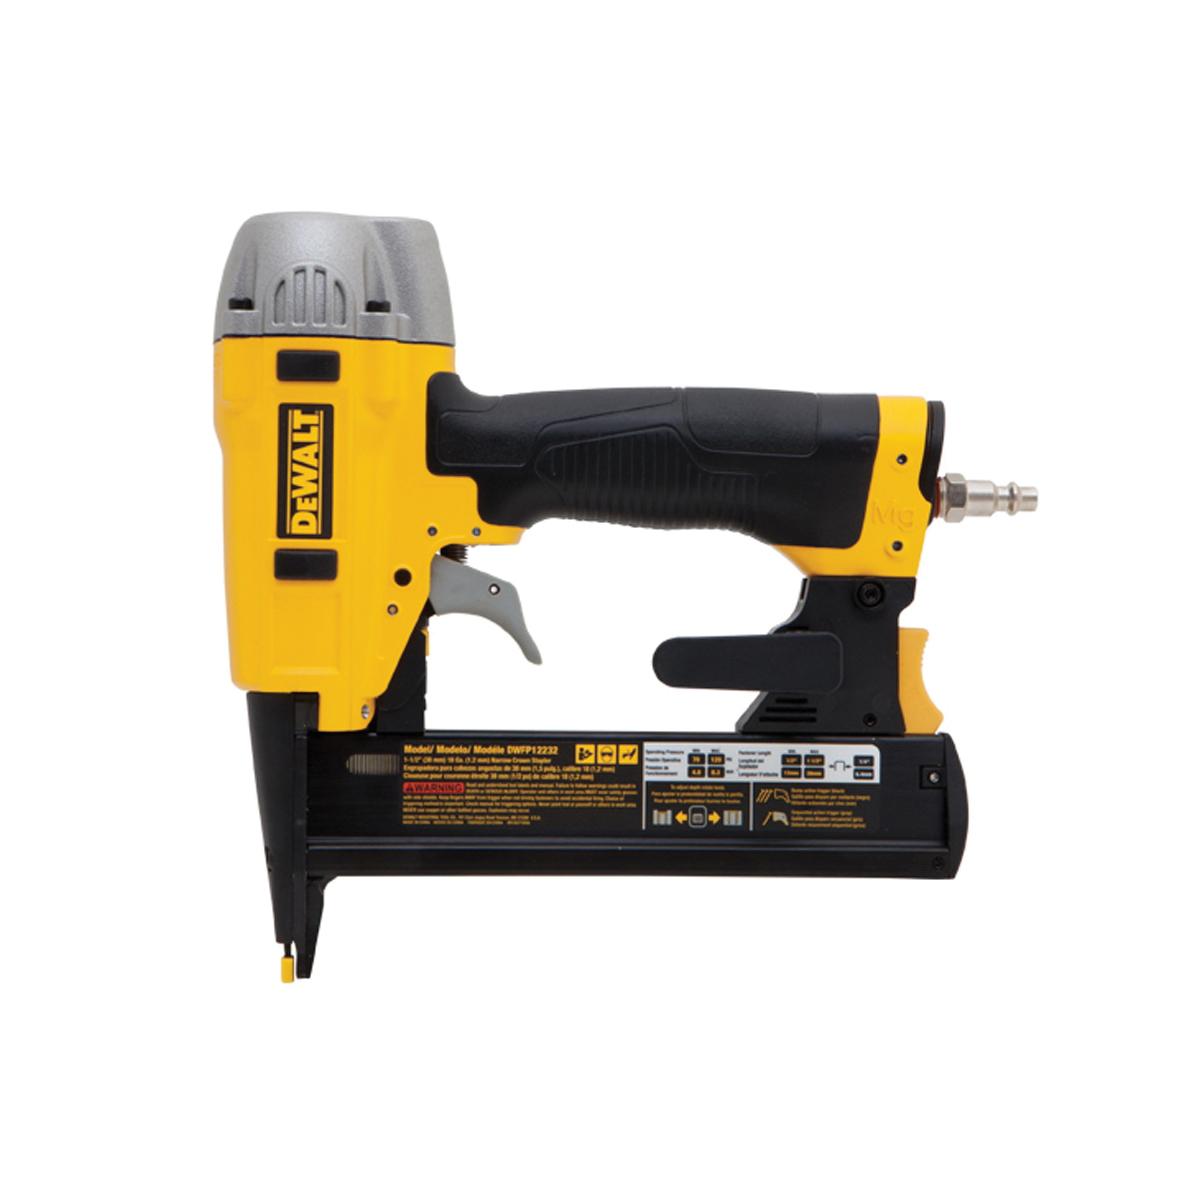 DeWALT® DWFP12232 Narrow Crown Stapler Kit, 1/4 in Crown, 100 Staple, 70 to 120 psi